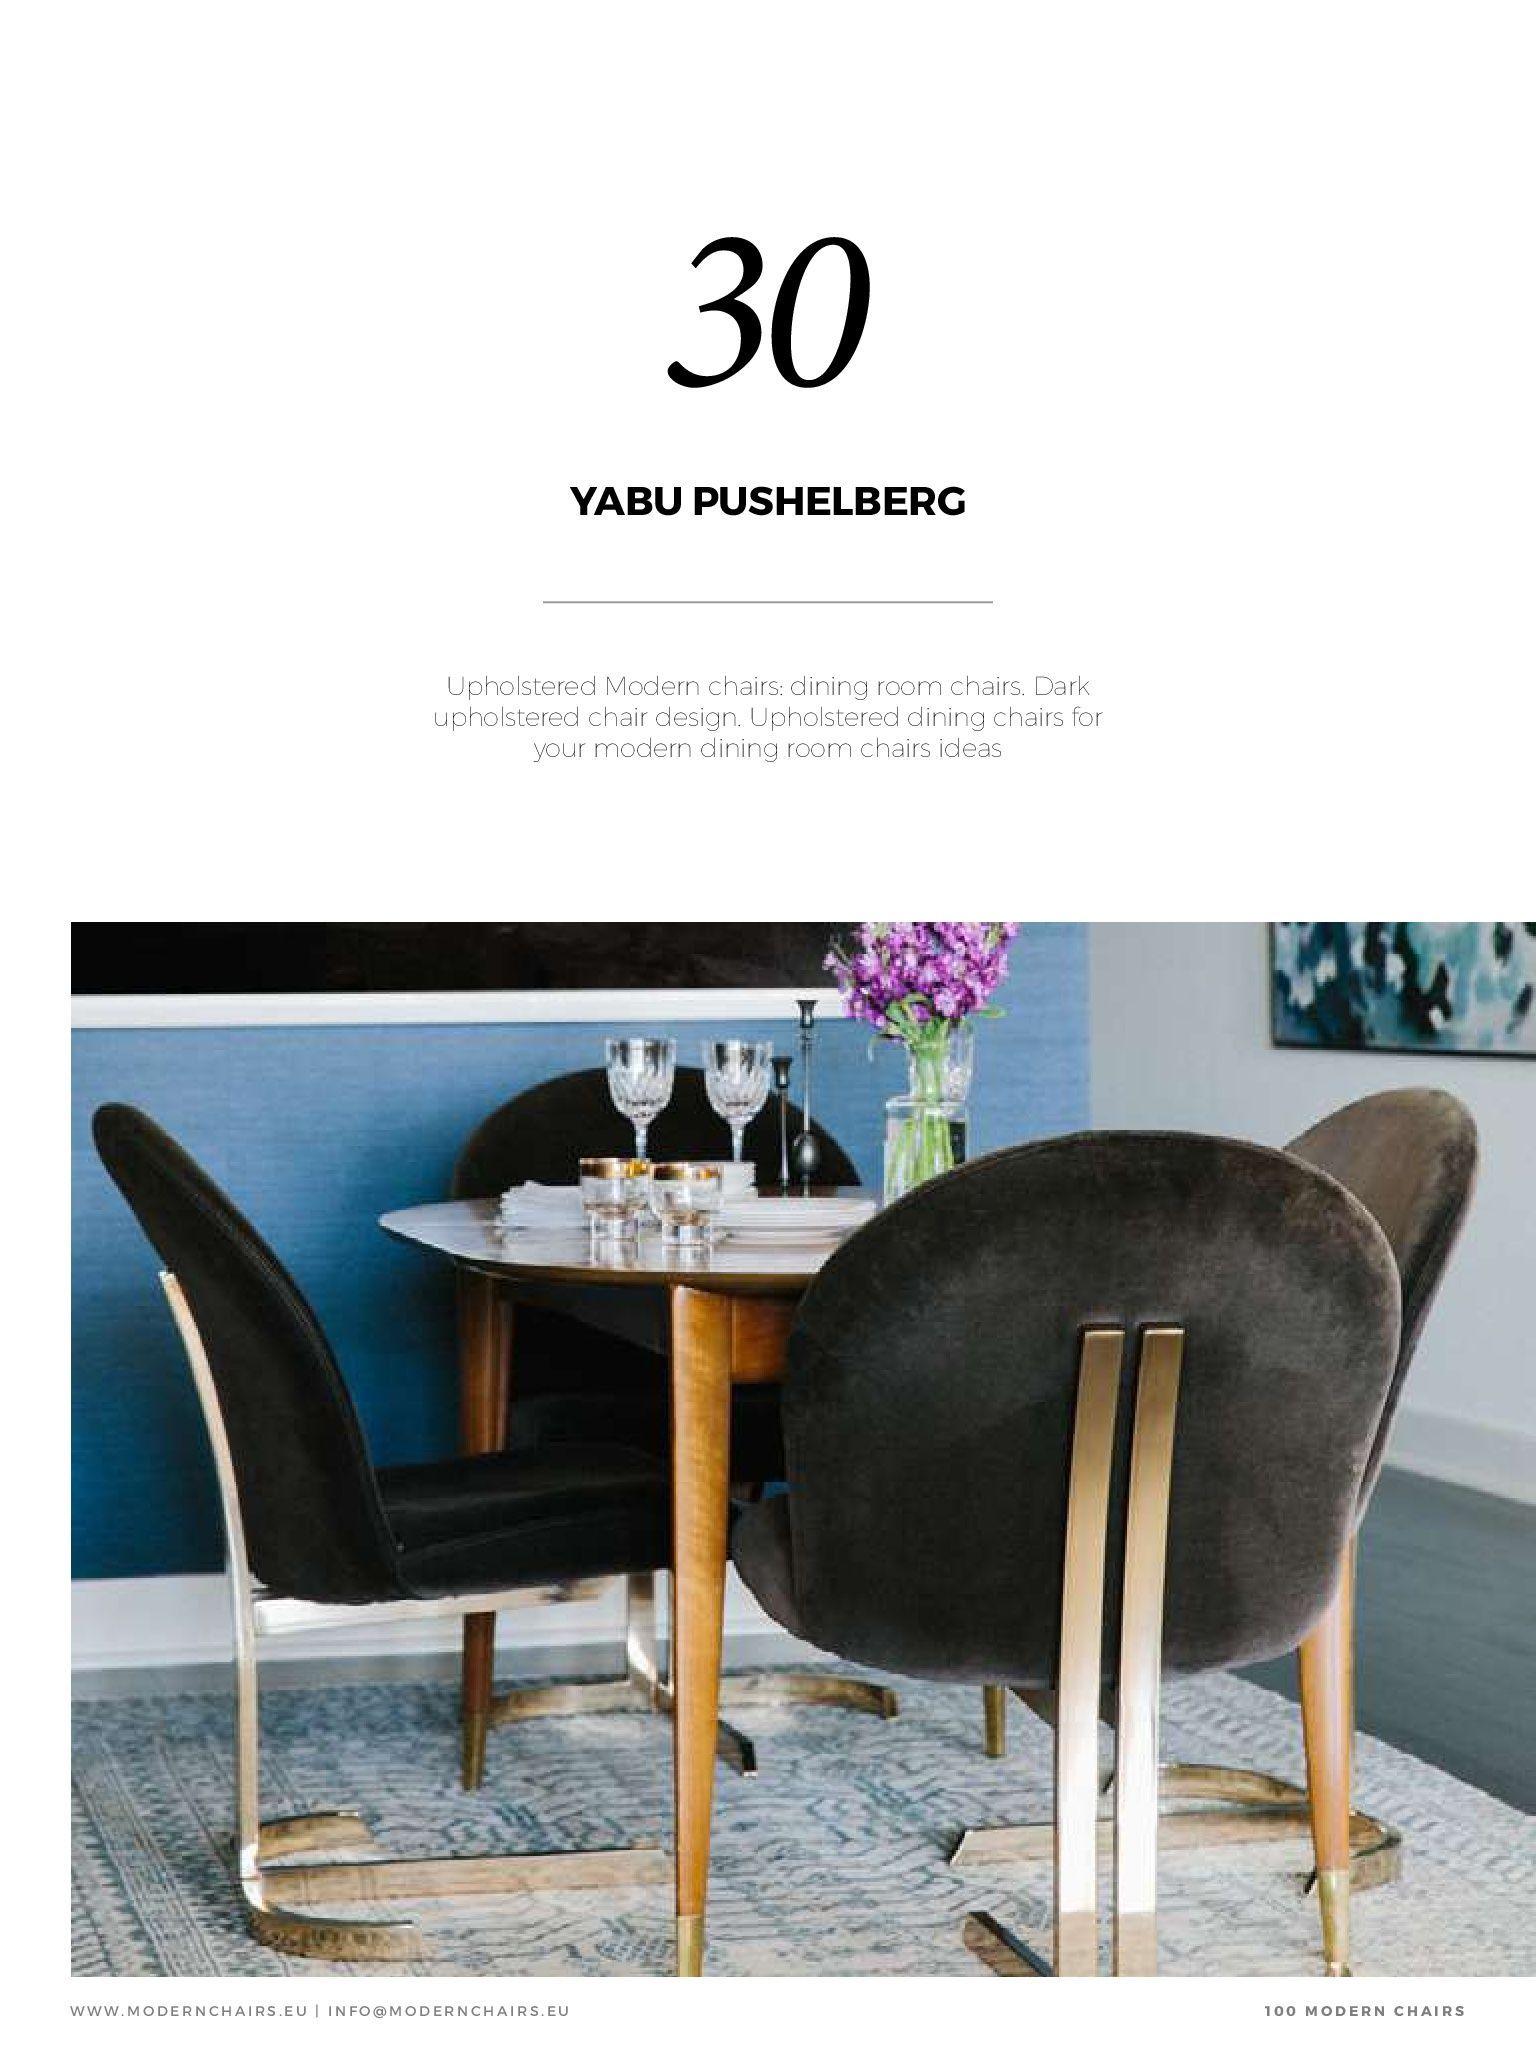 Sedie Moderne Di Design.Sedie Moderne Blog Presenta 100 Idee Di Sedie Moderne Qui